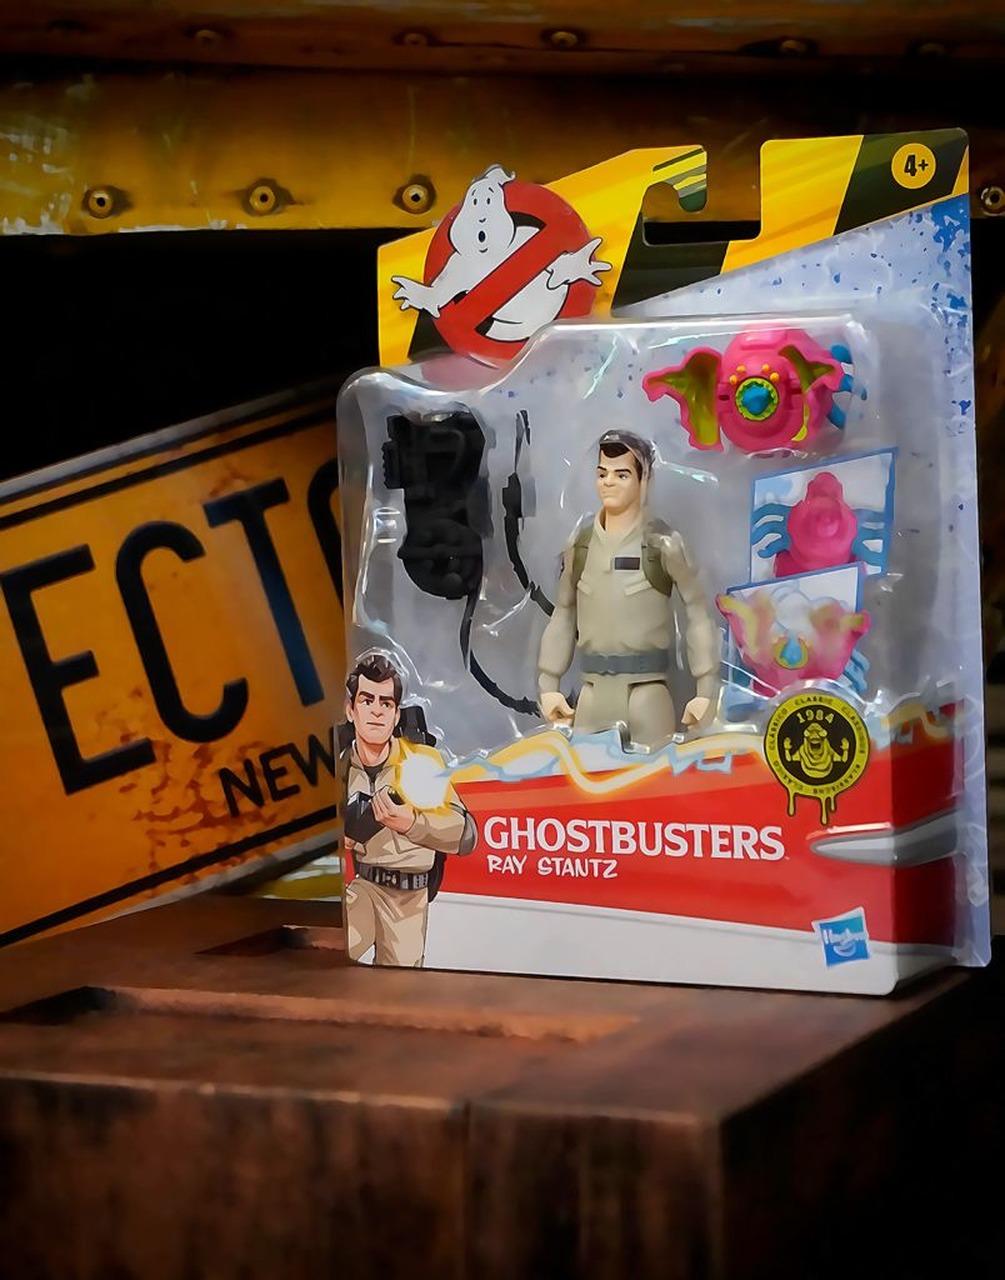 Boneco Action Figure Ray Stantz e Fantasma Rosa Os Caça Fantasmas Ghostbusters E9544 - Hasbro